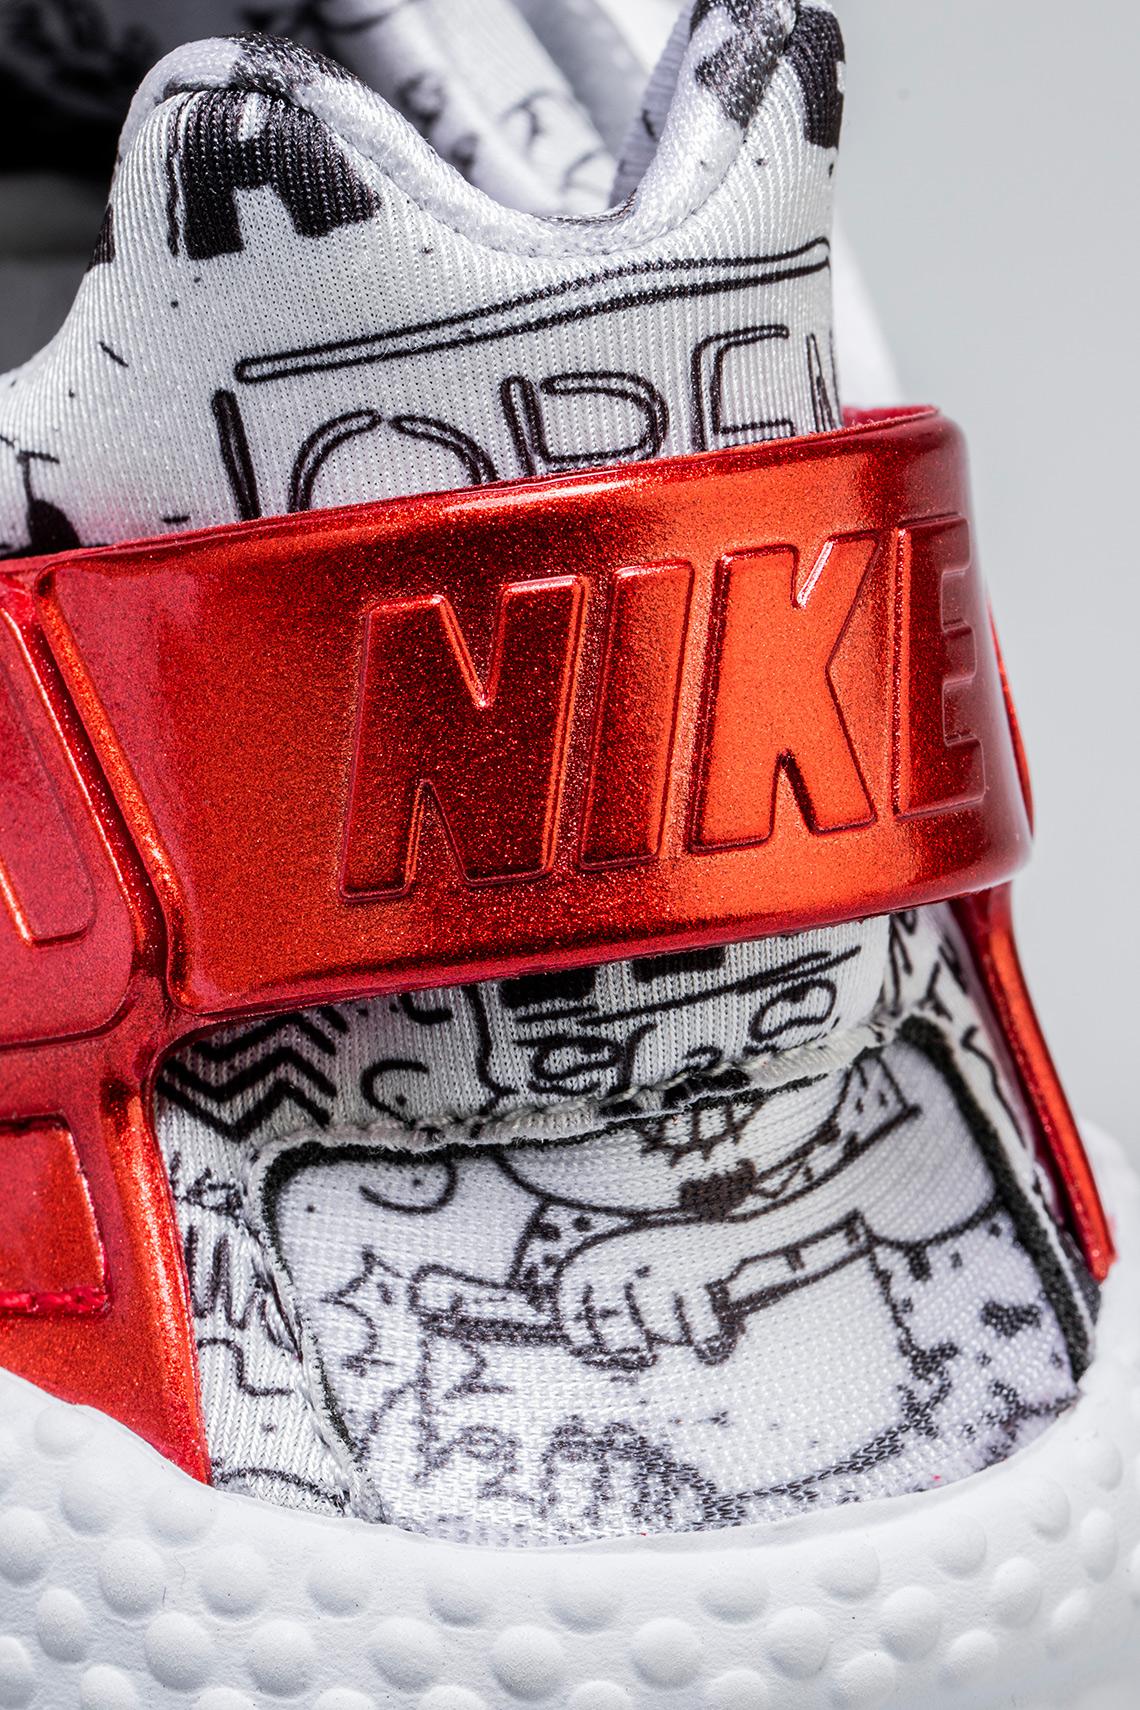 04988c25f372d Source  Sneaker News ·  SOURCESTYLE25th anniversaryAir Huaracheartartists collaborationsfashionJoonbugkicksnikeNike Air HuaracheShoe Palacesneakers style